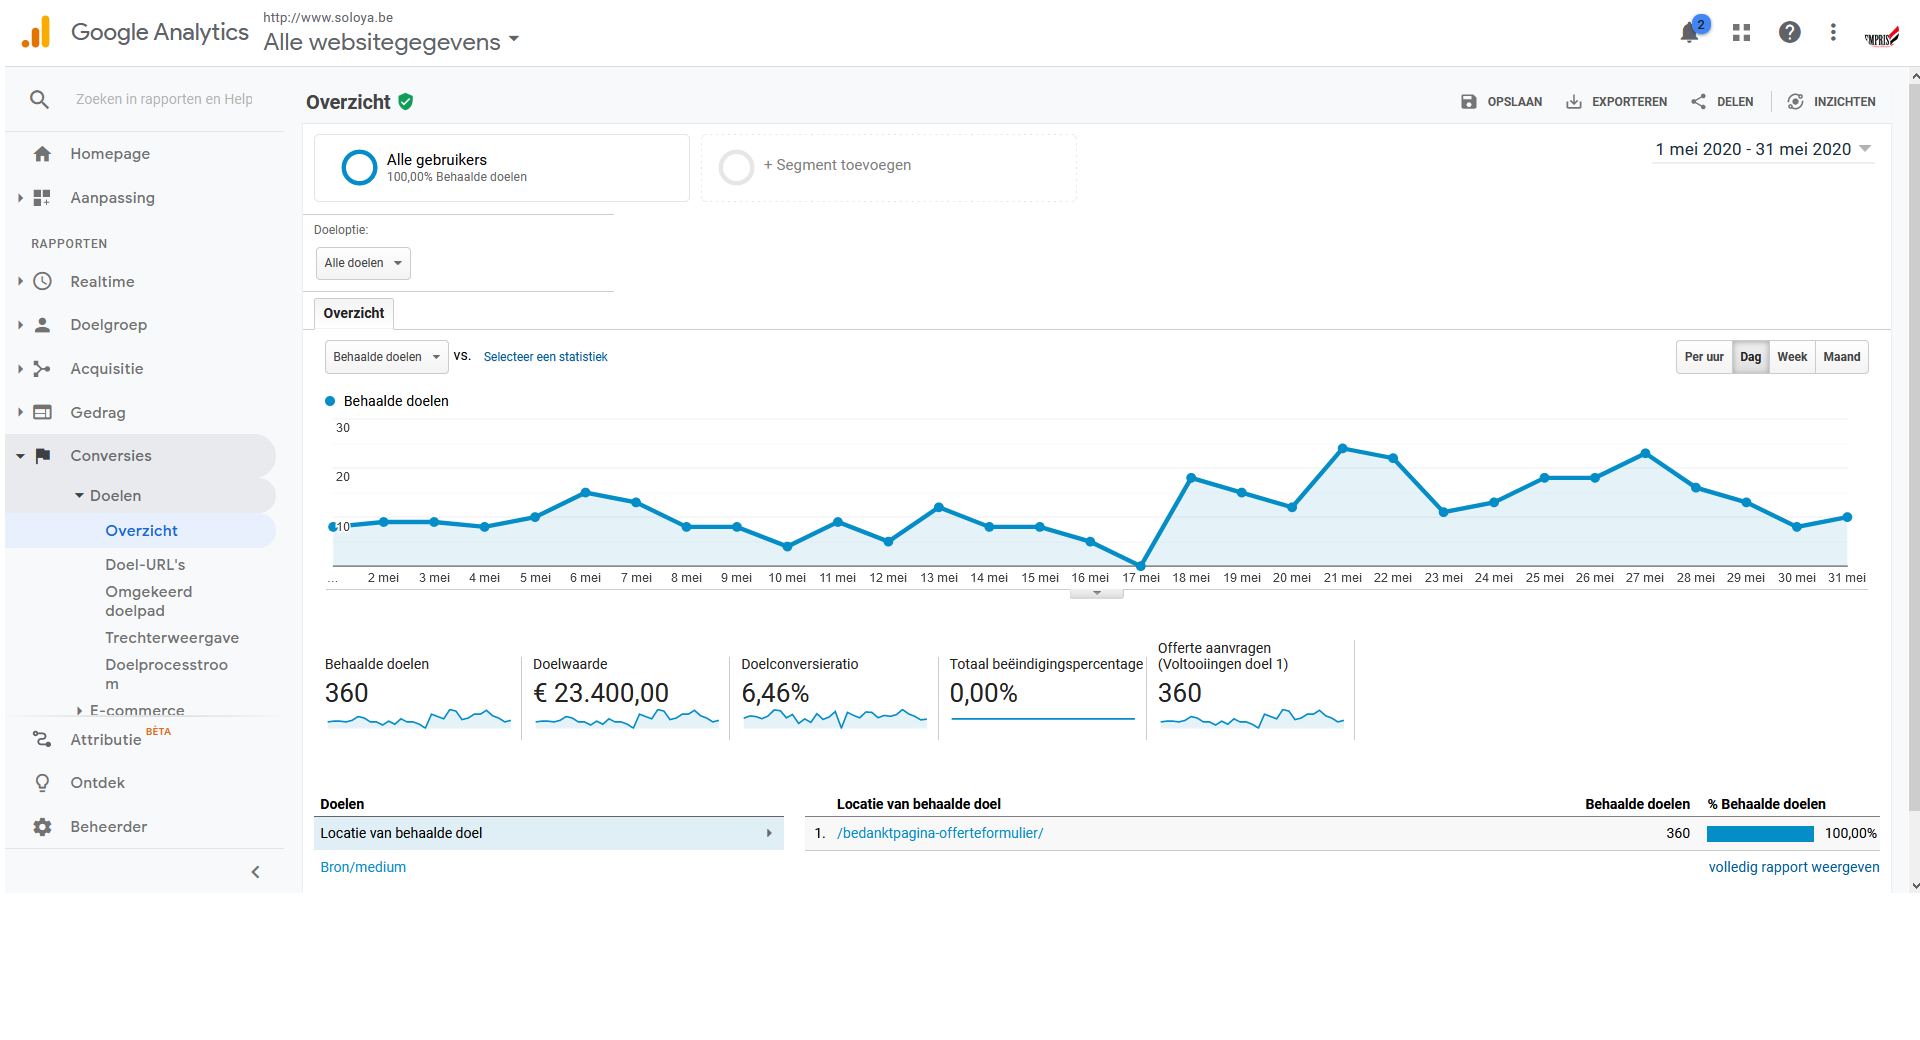 Soloya Google Analytics maand mei 2020